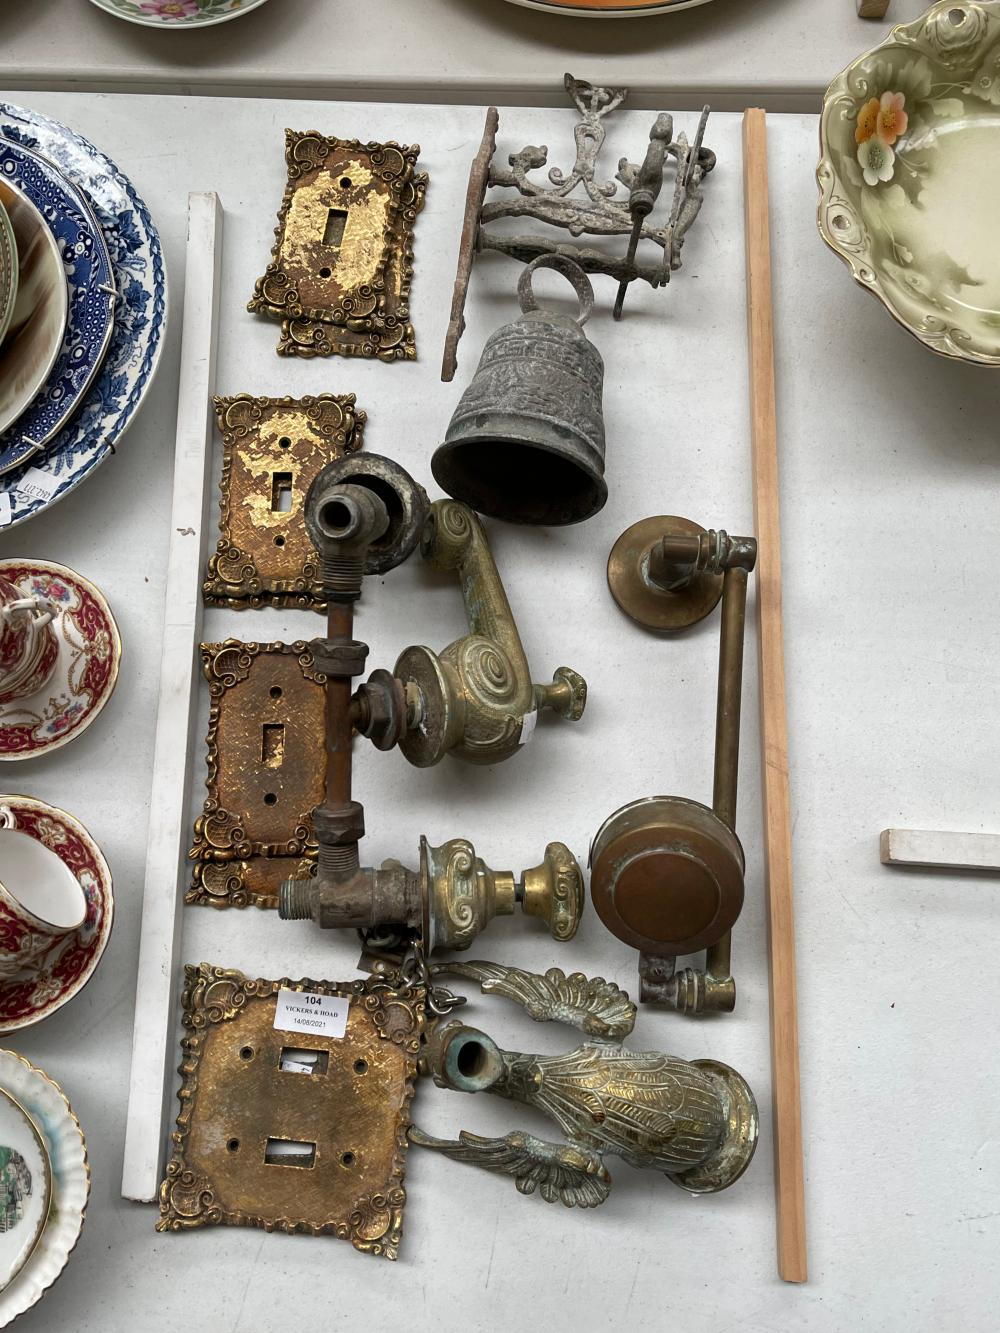 Assortment of cast brass tap fittings, bell & brass switch plates